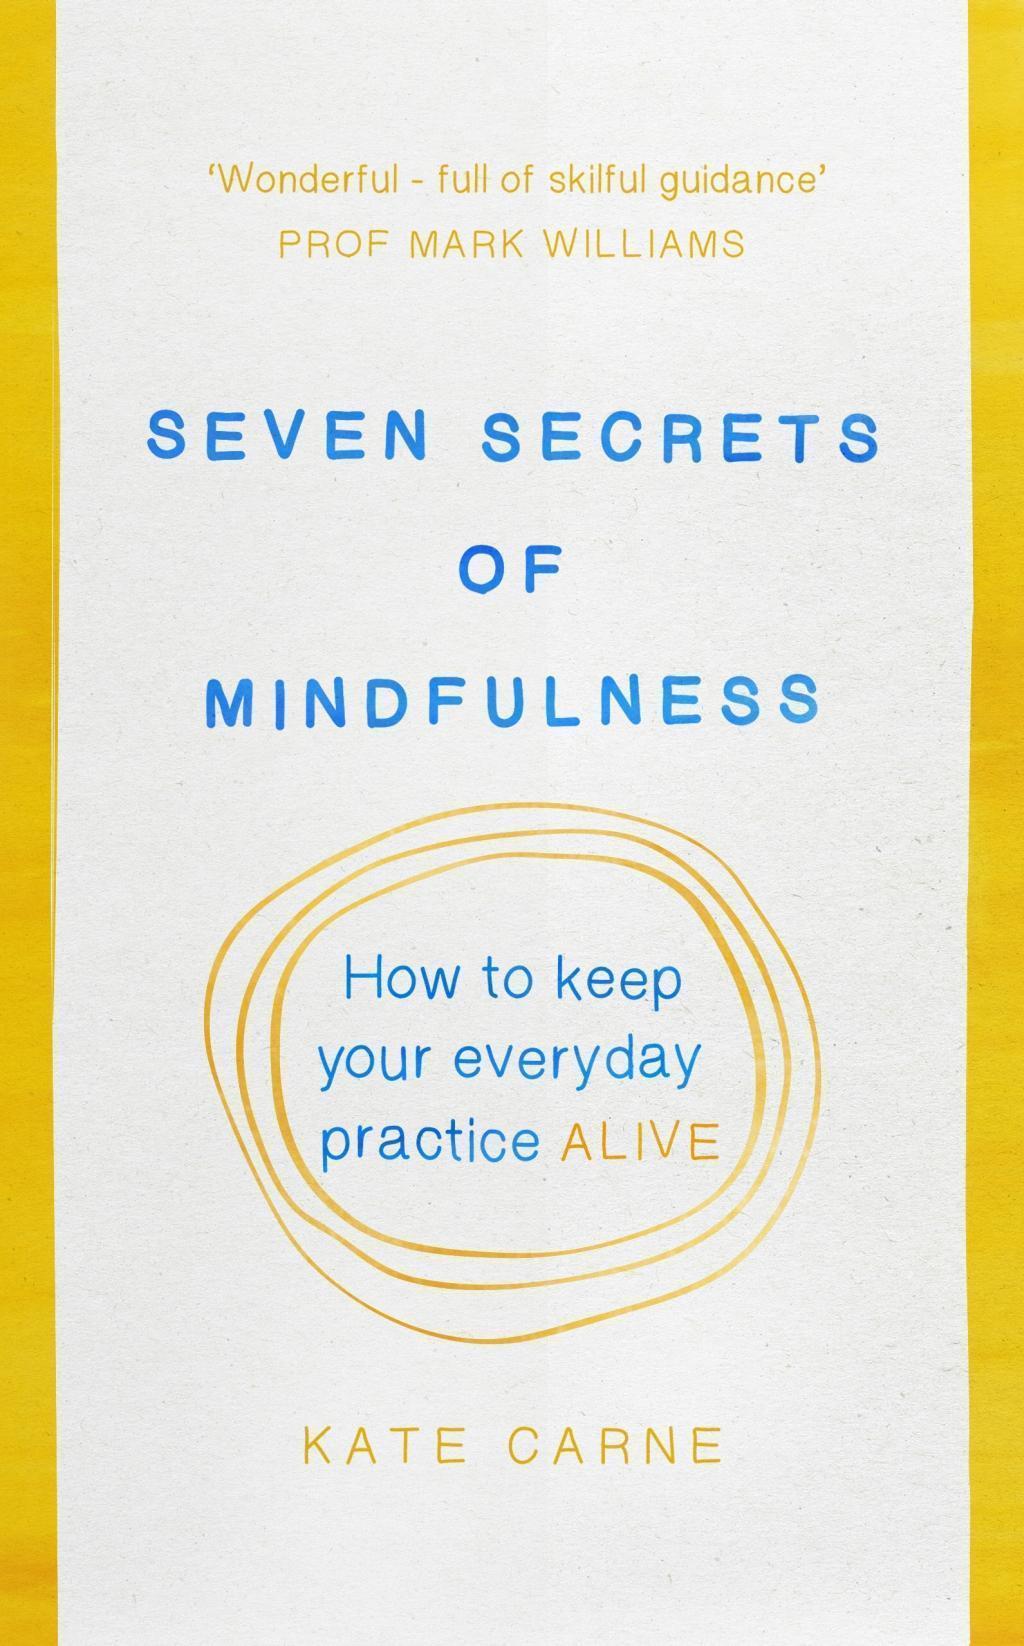 Seven Secrets of Mindfulness